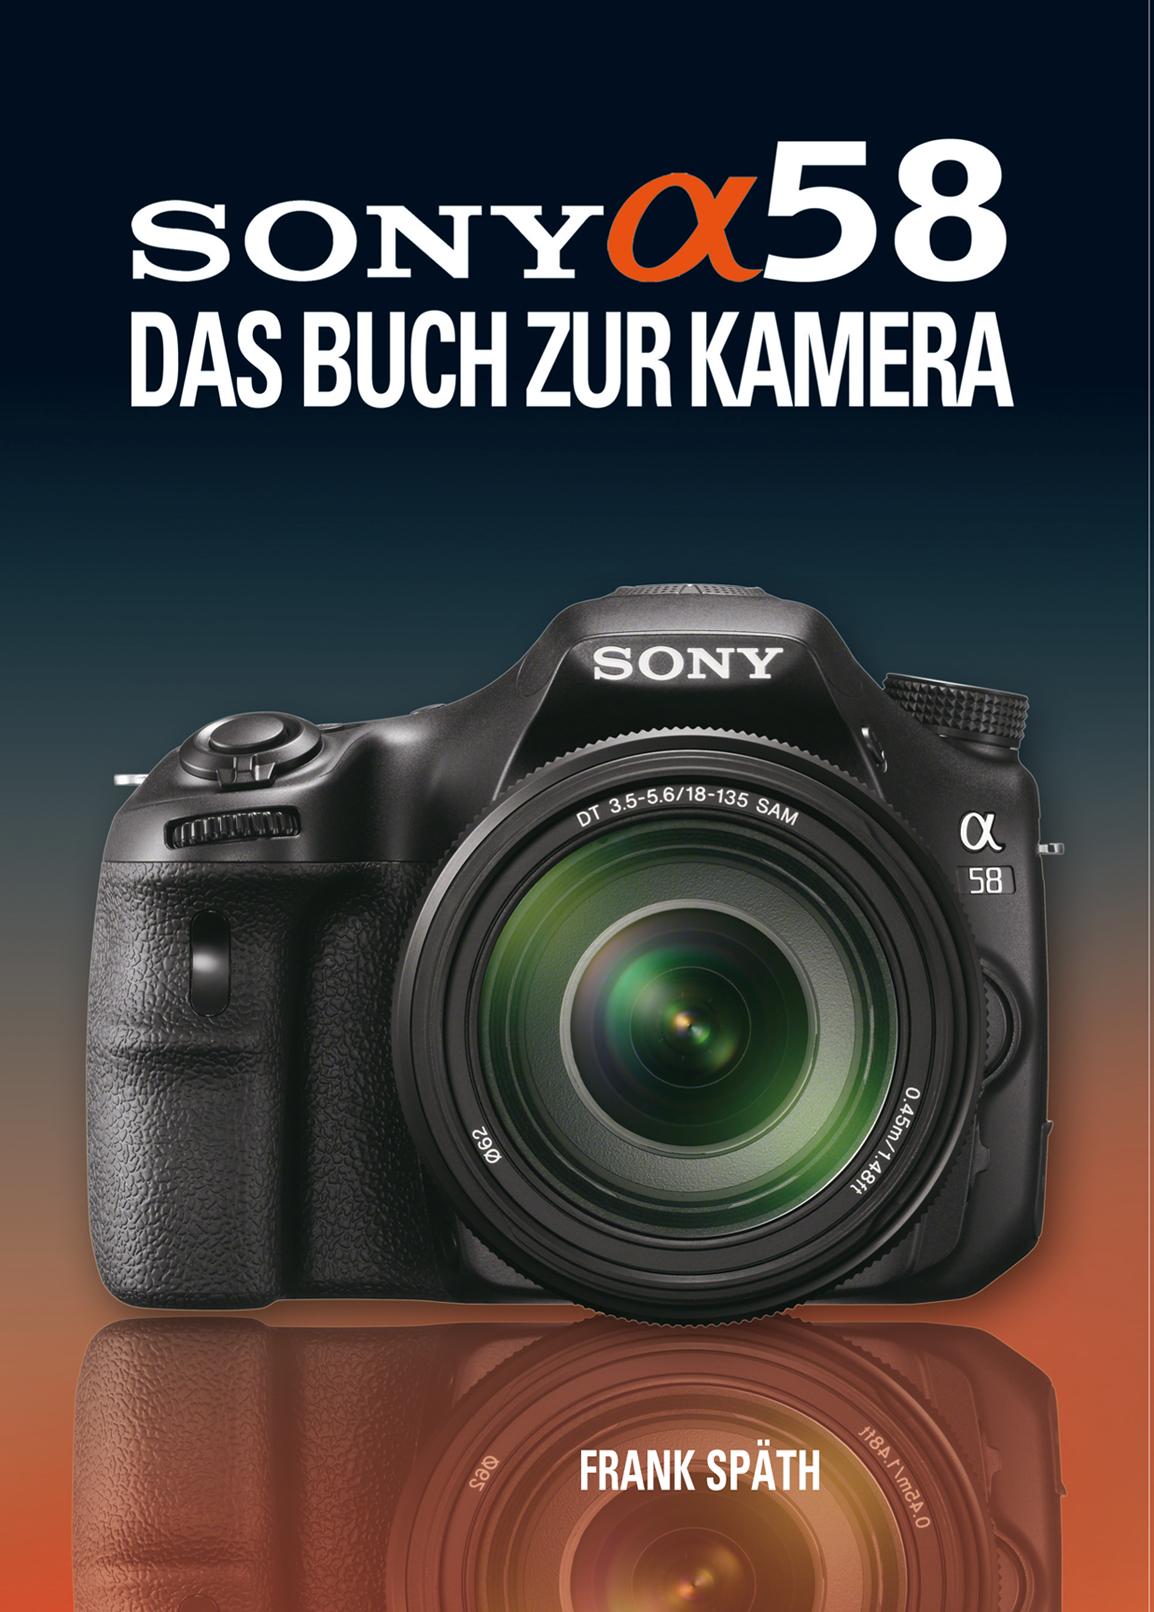 Sony Alpha 58: Das Buch zur Kamera - Frank Späth